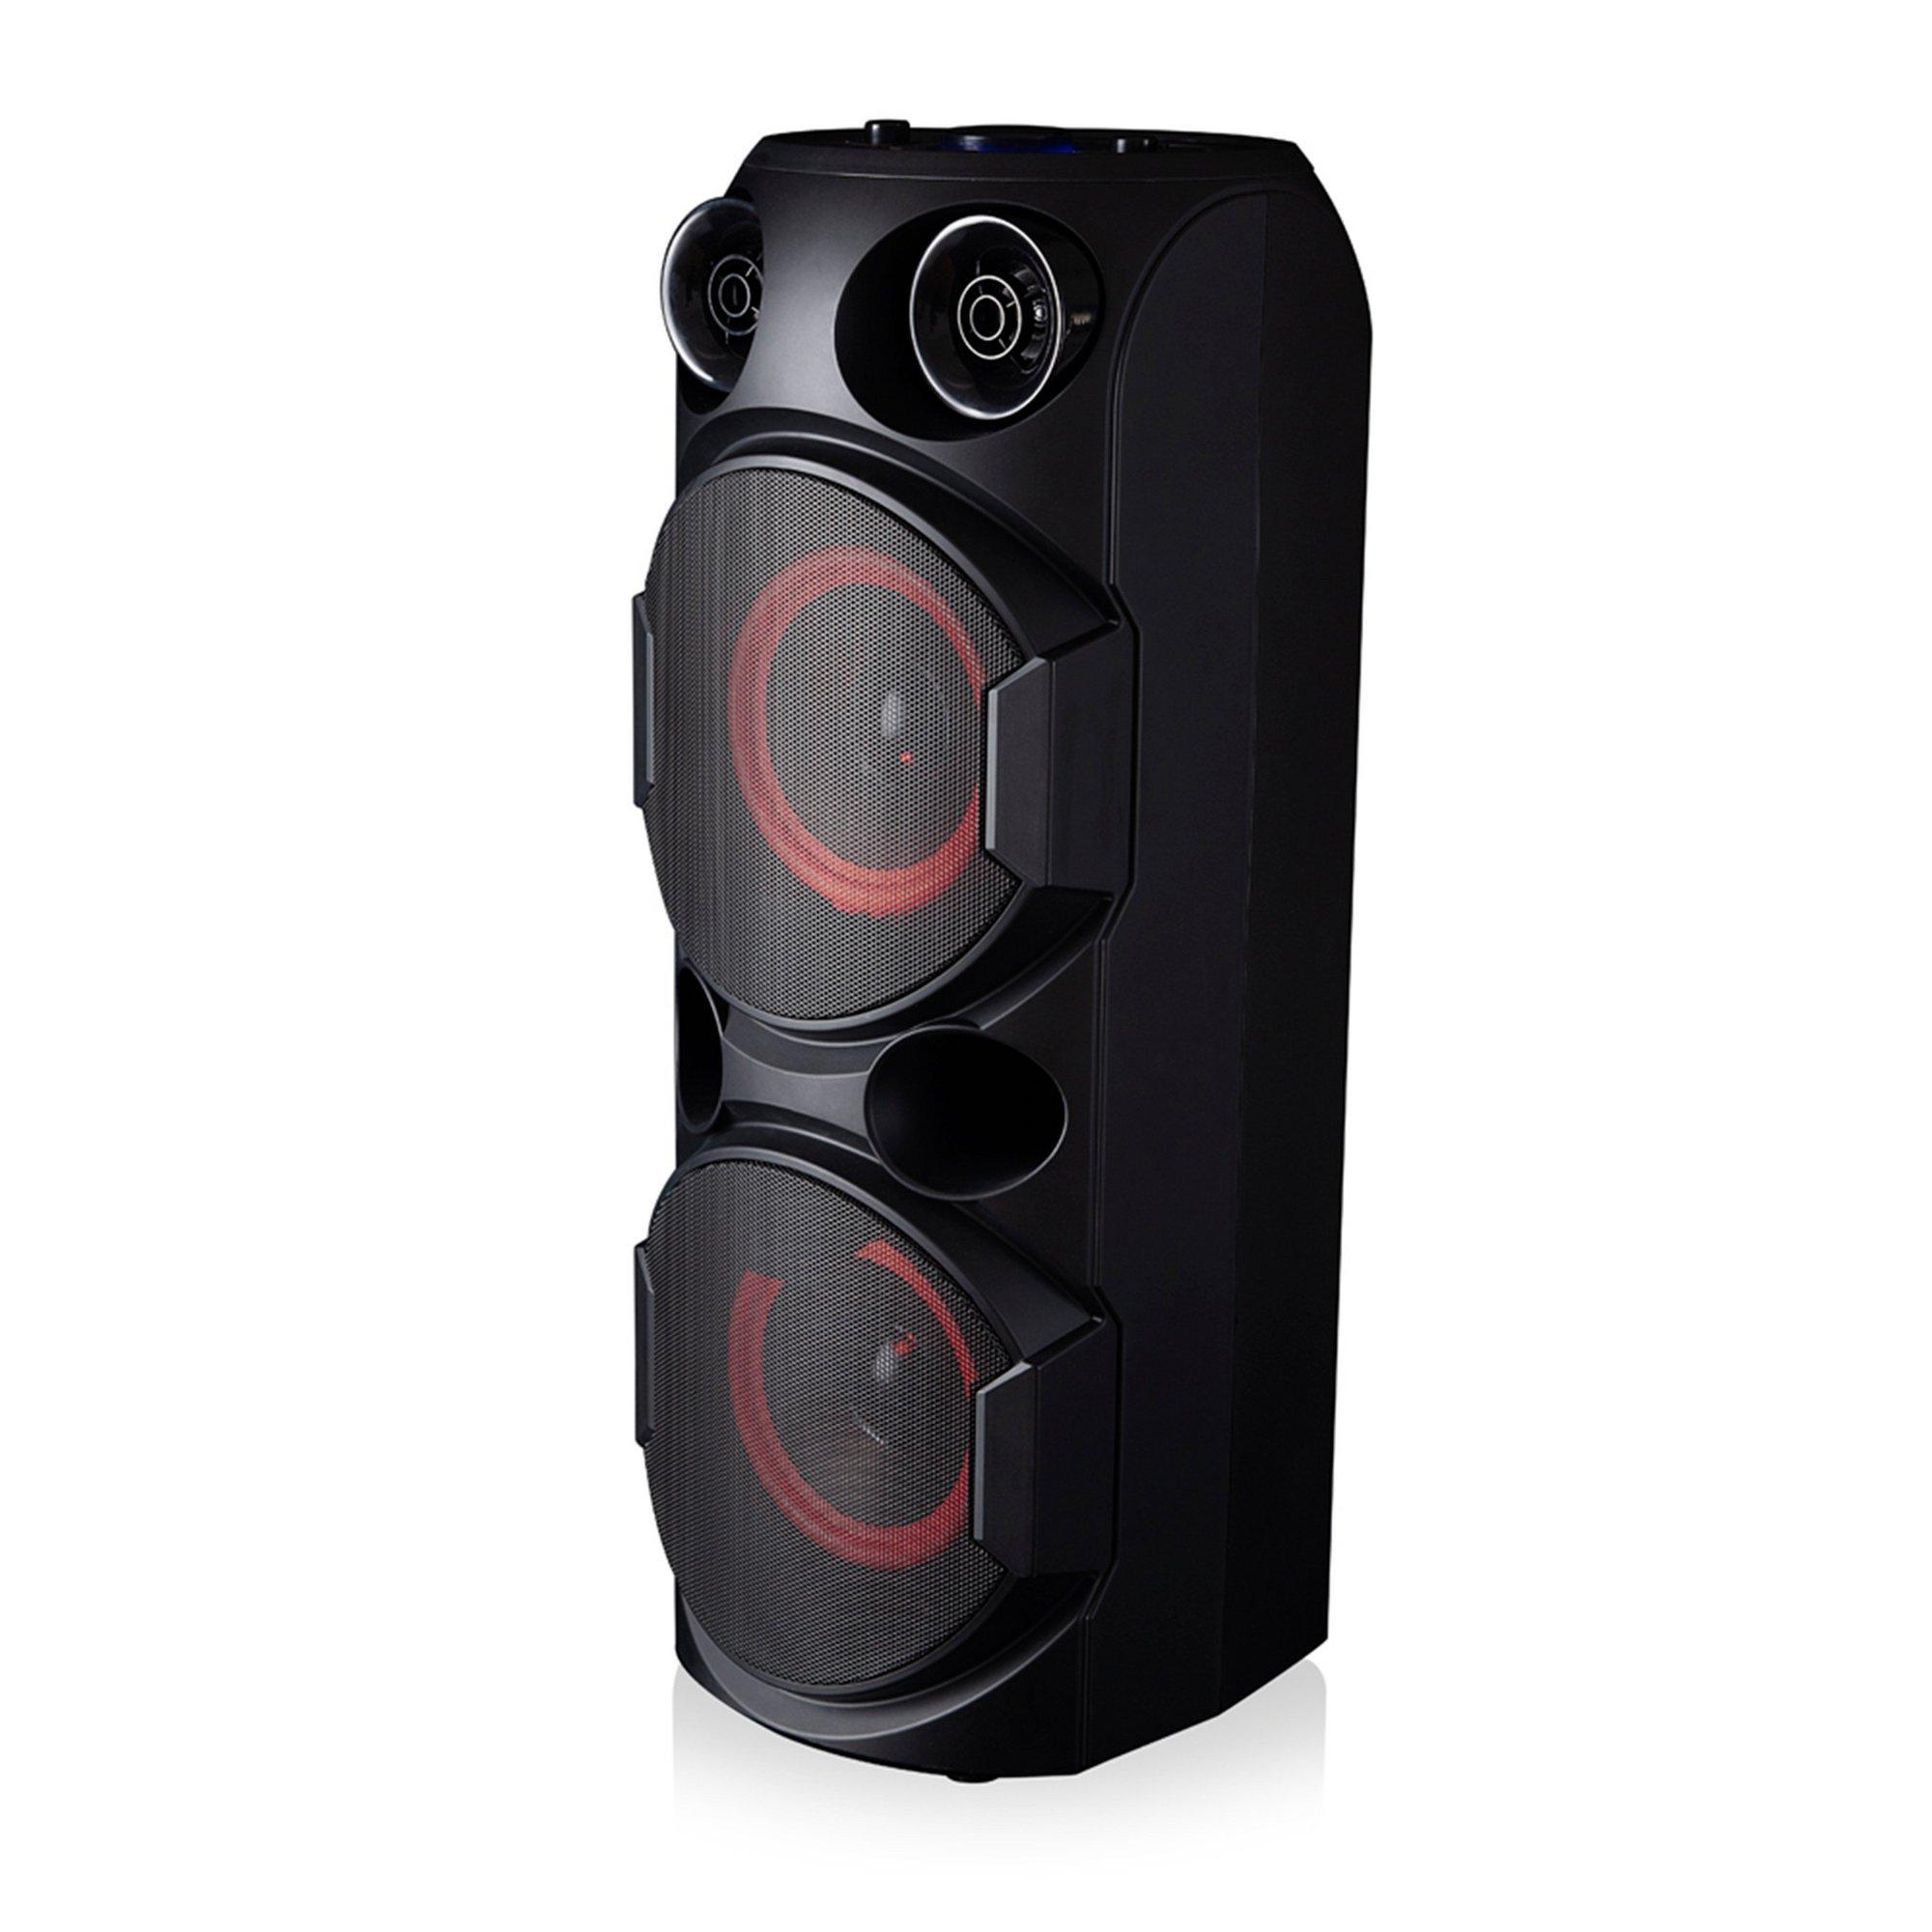 Image of AKAI 200W Bluetooth Party Speaker